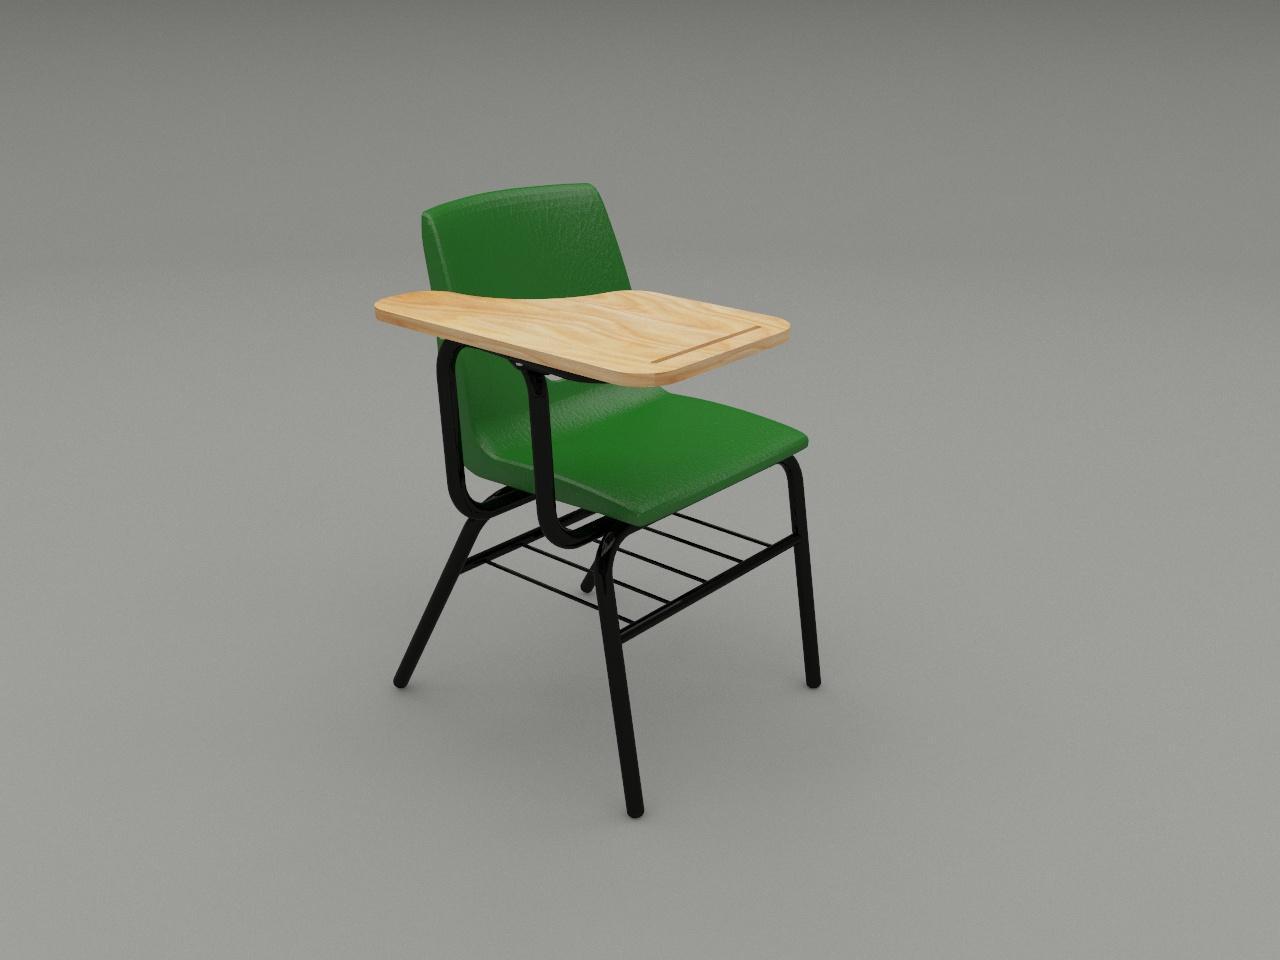 silla de paleta concha plastica color verde paleta de triplay 15 mm r0.75 negro convencional